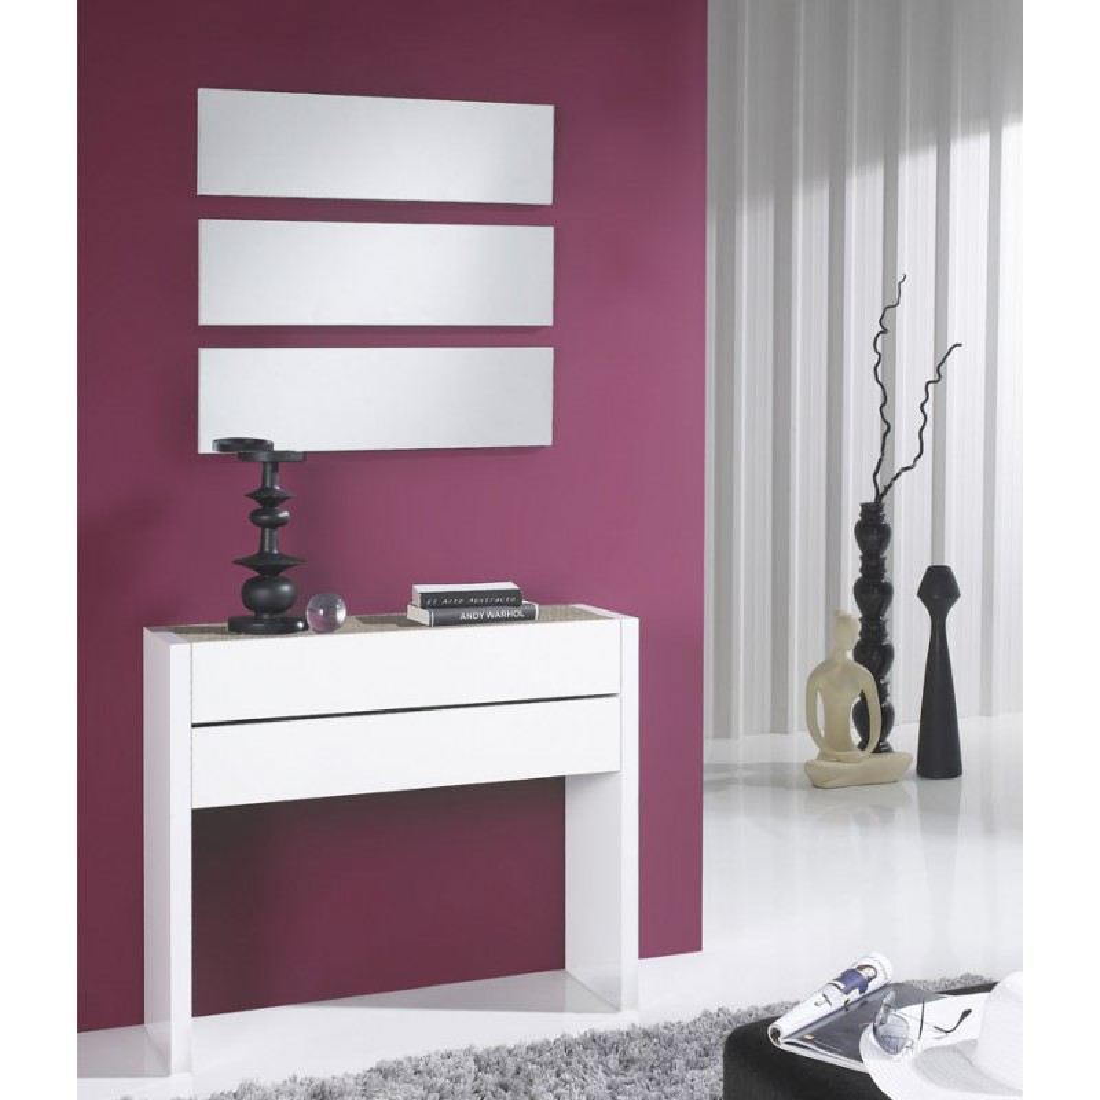 meuble d 39 entr e blanc laqu ch ne clair miroirs nosila petits meubles. Black Bedroom Furniture Sets. Home Design Ideas